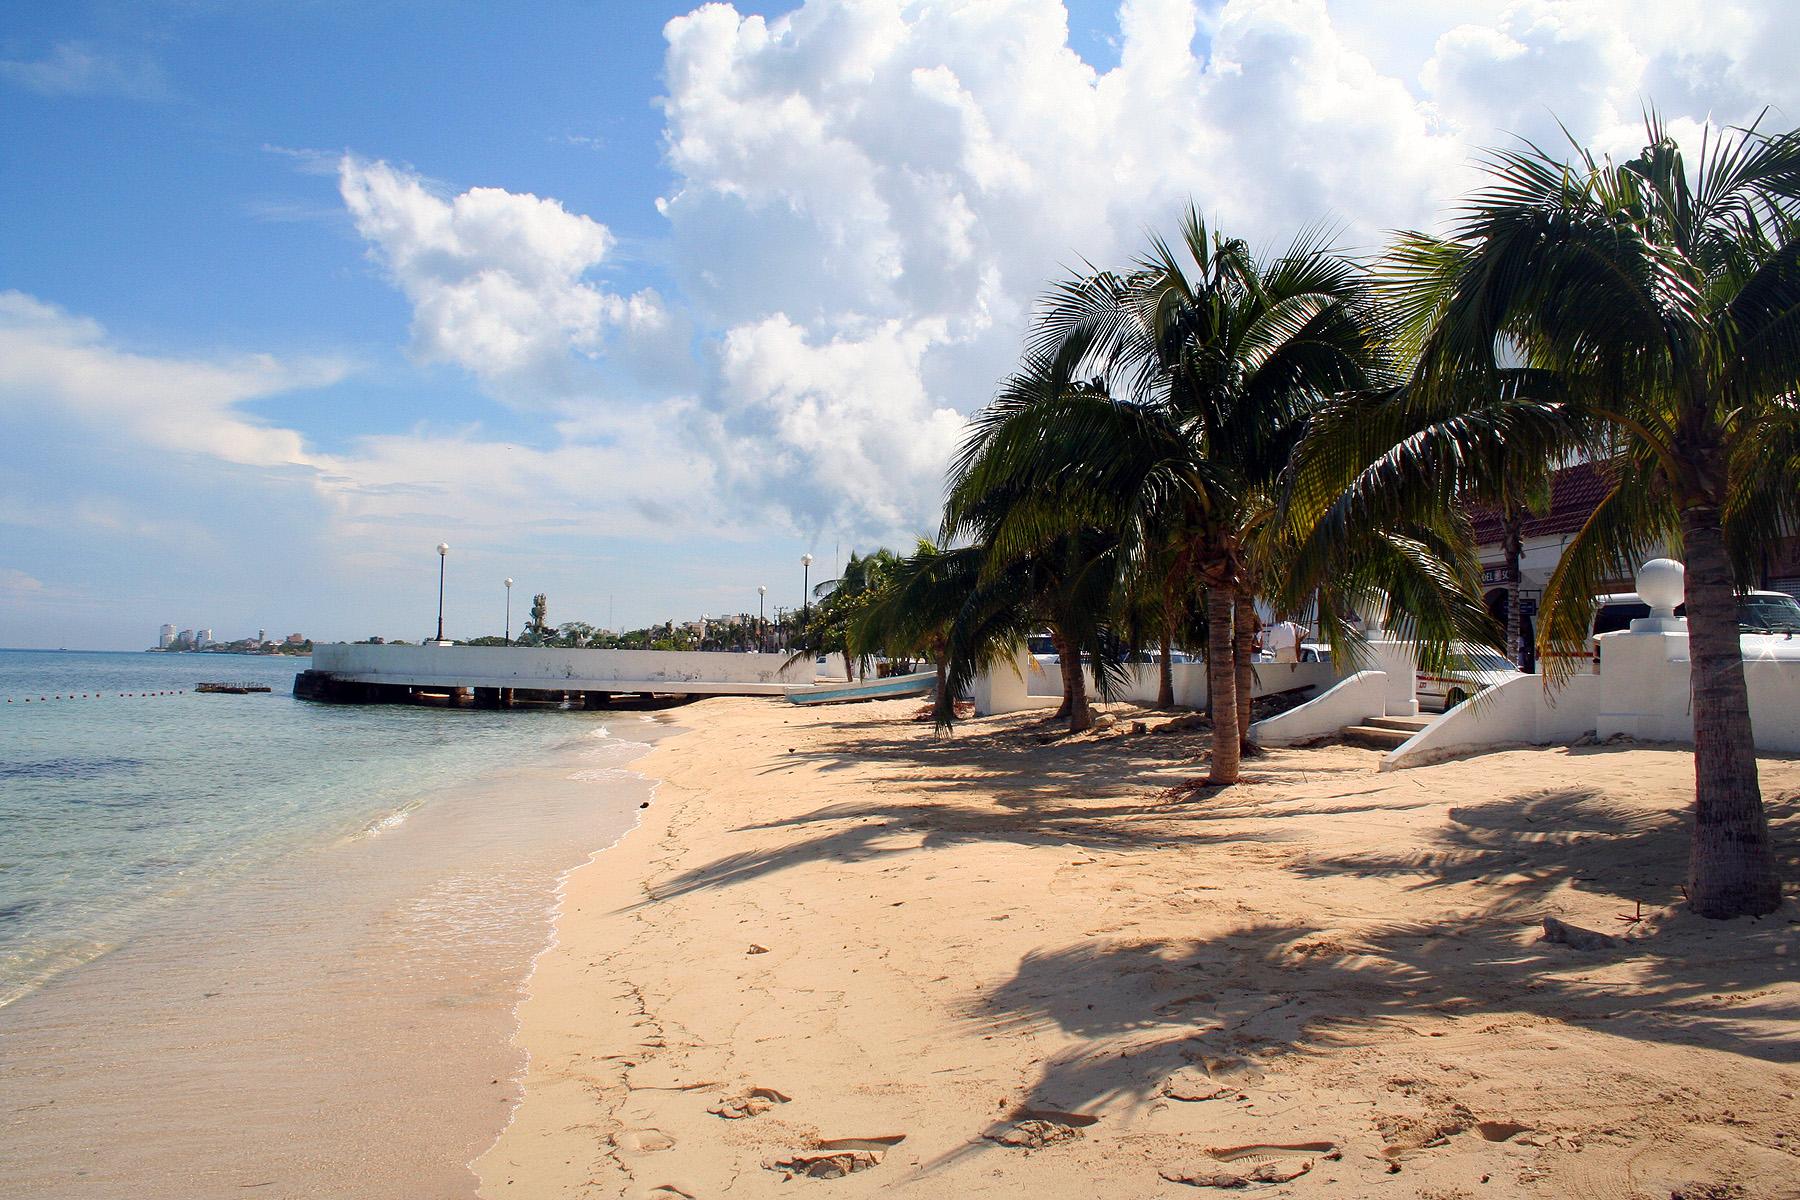 Tropical beach with palm trees, Beach, Harbor, Palm, Trees, HQ Photo